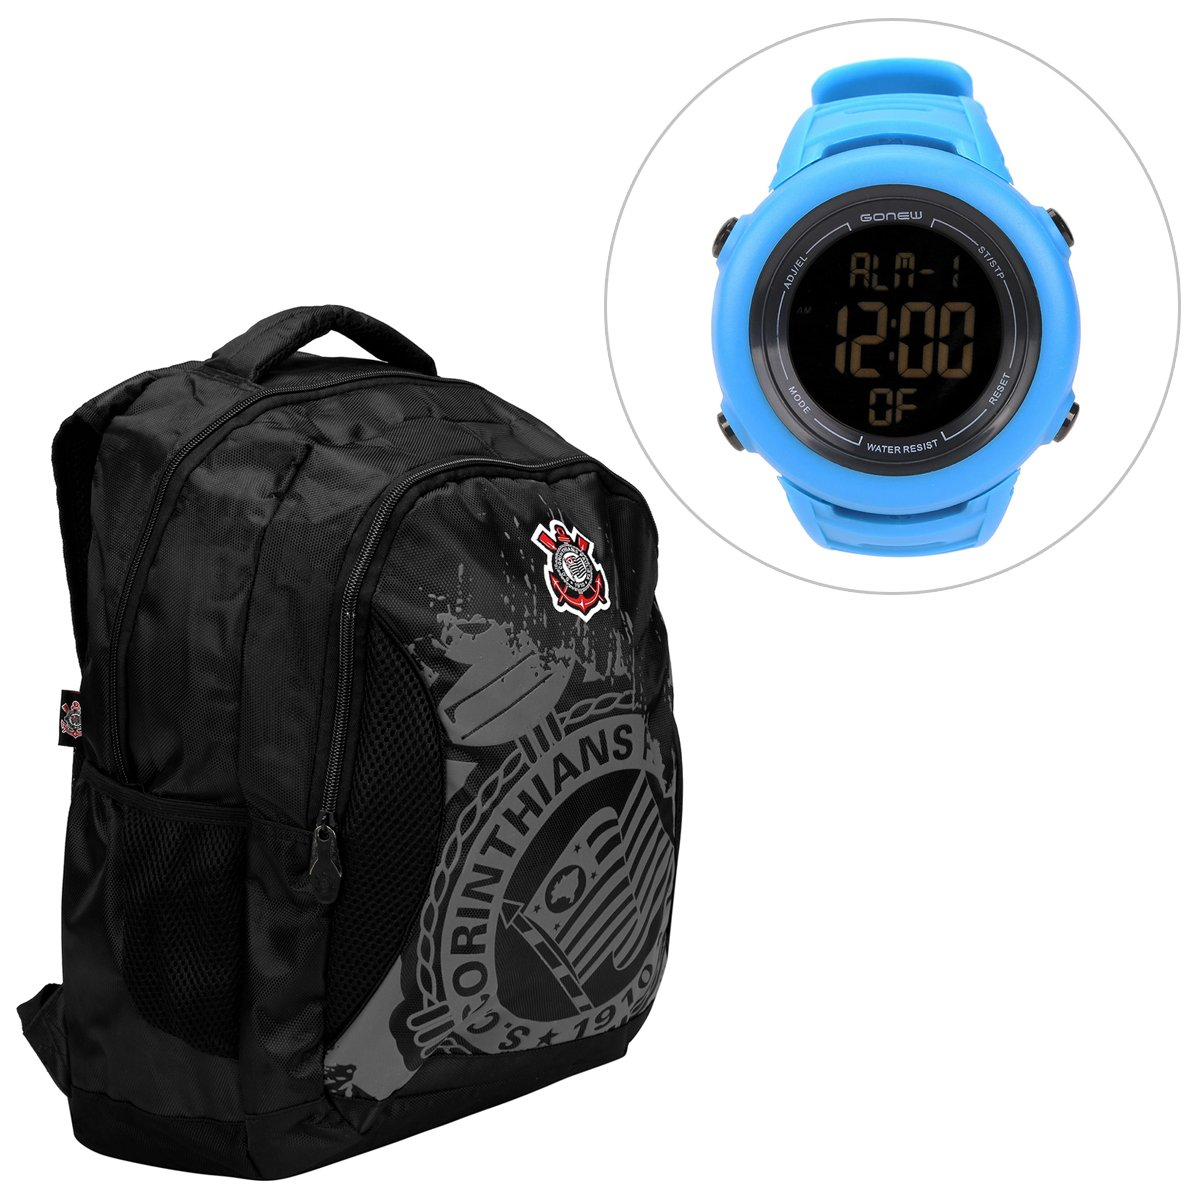 2dca6c847e Kit Mochila Corinthians + Relógio Gonew Energy 2 - Compre Agora ...